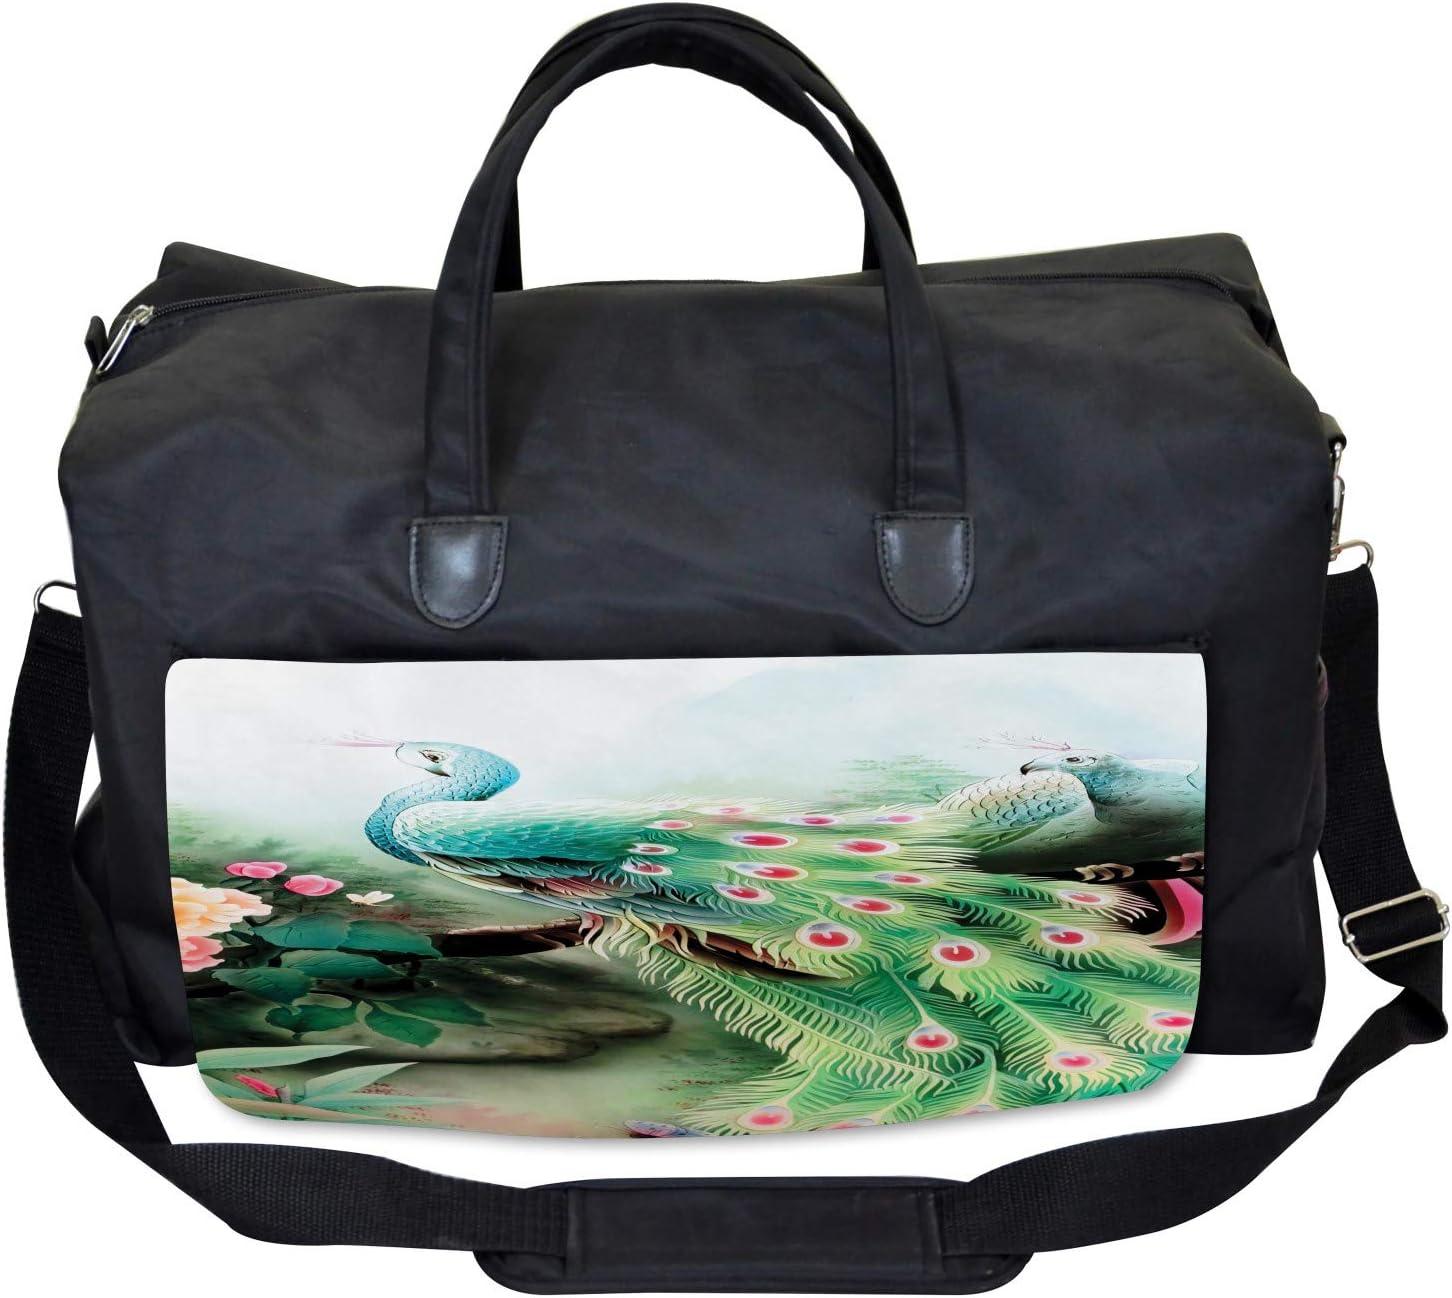 Summer Flower Garden Ambesonne Peacock Gym Bag Large Weekender Carry-on